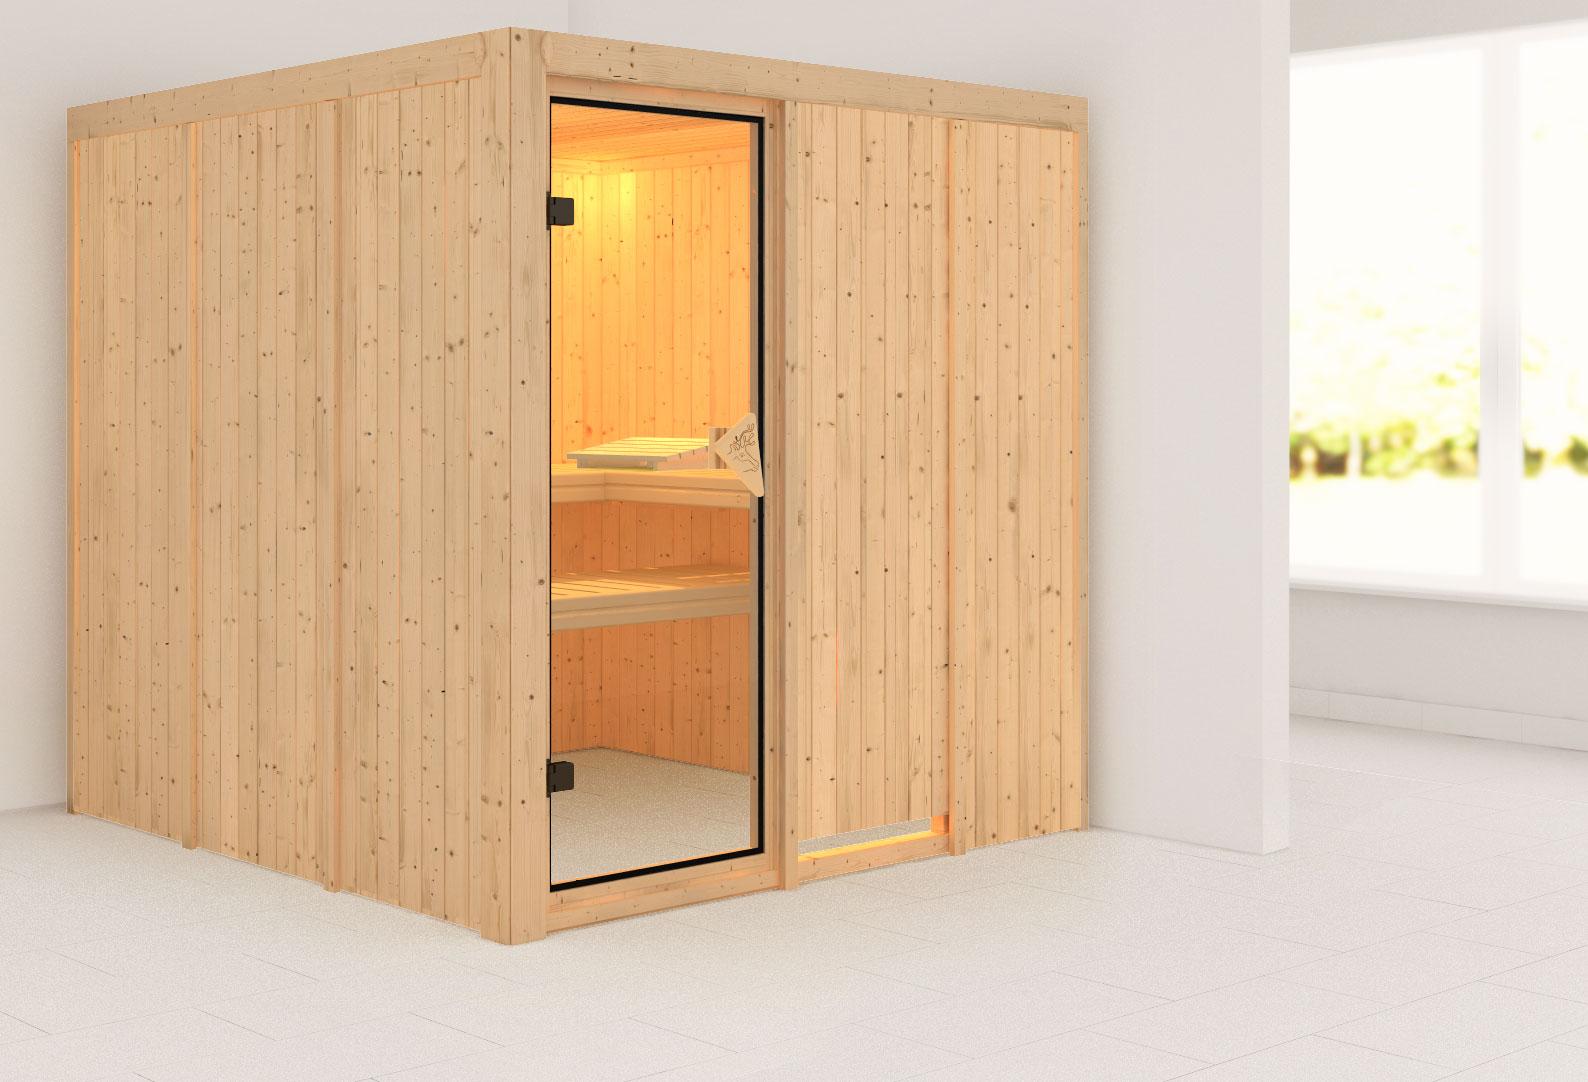 karibu sauna rodin 68mm ohne ofen classic t r bei. Black Bedroom Furniture Sets. Home Design Ideas